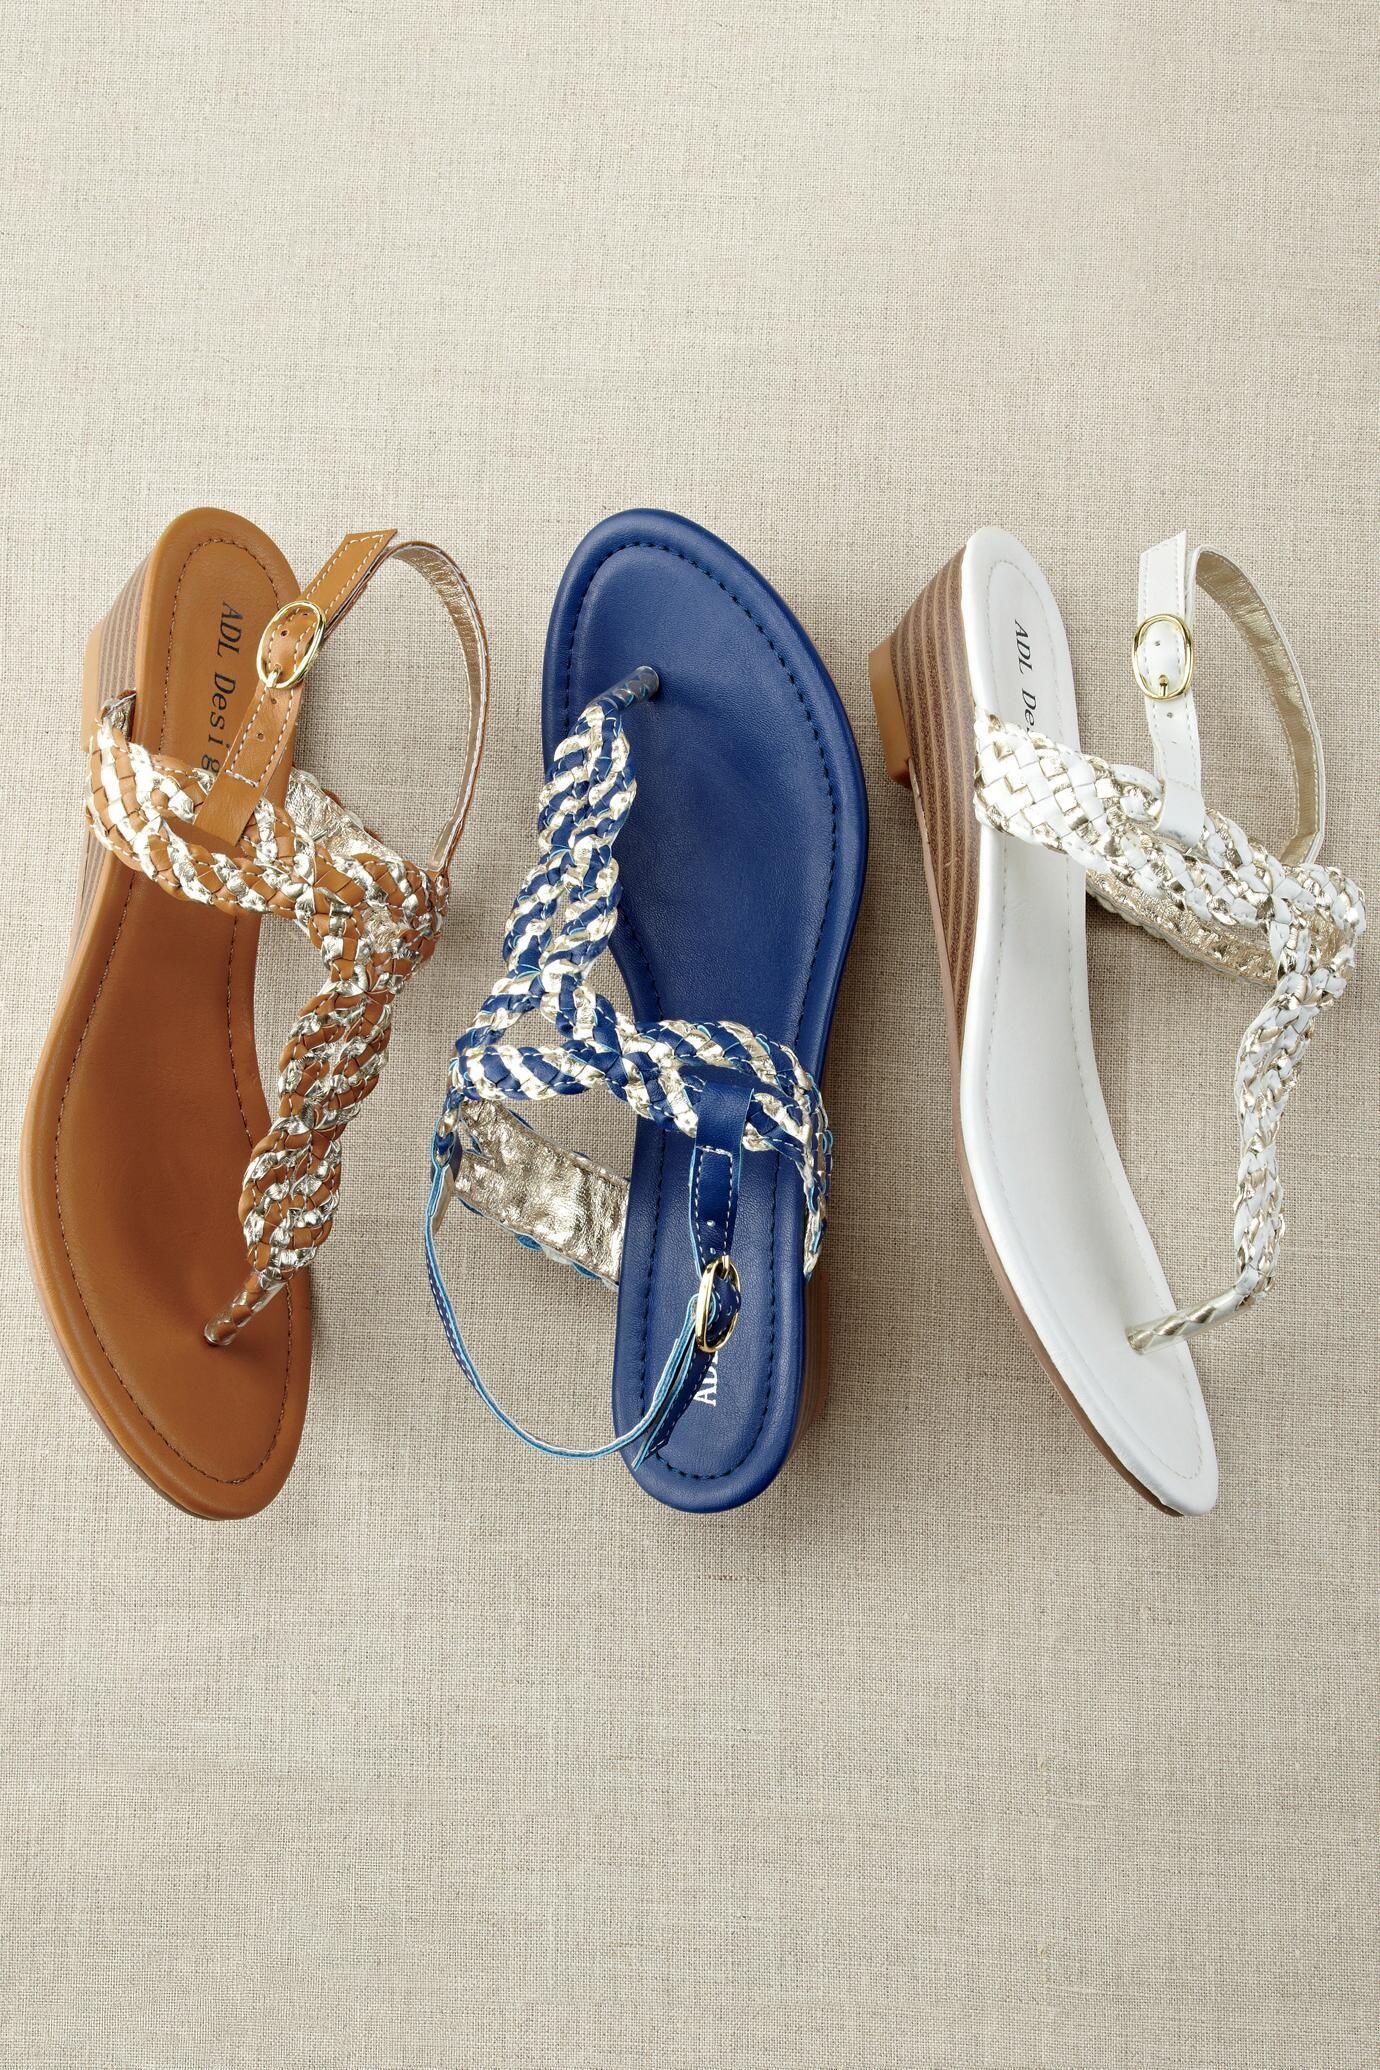 bf75d7e98 Braided Thong Wedge Sandal by Boston Design Studio™  Classic Women s  Clothing from  ChadwicksofBoston  34.99